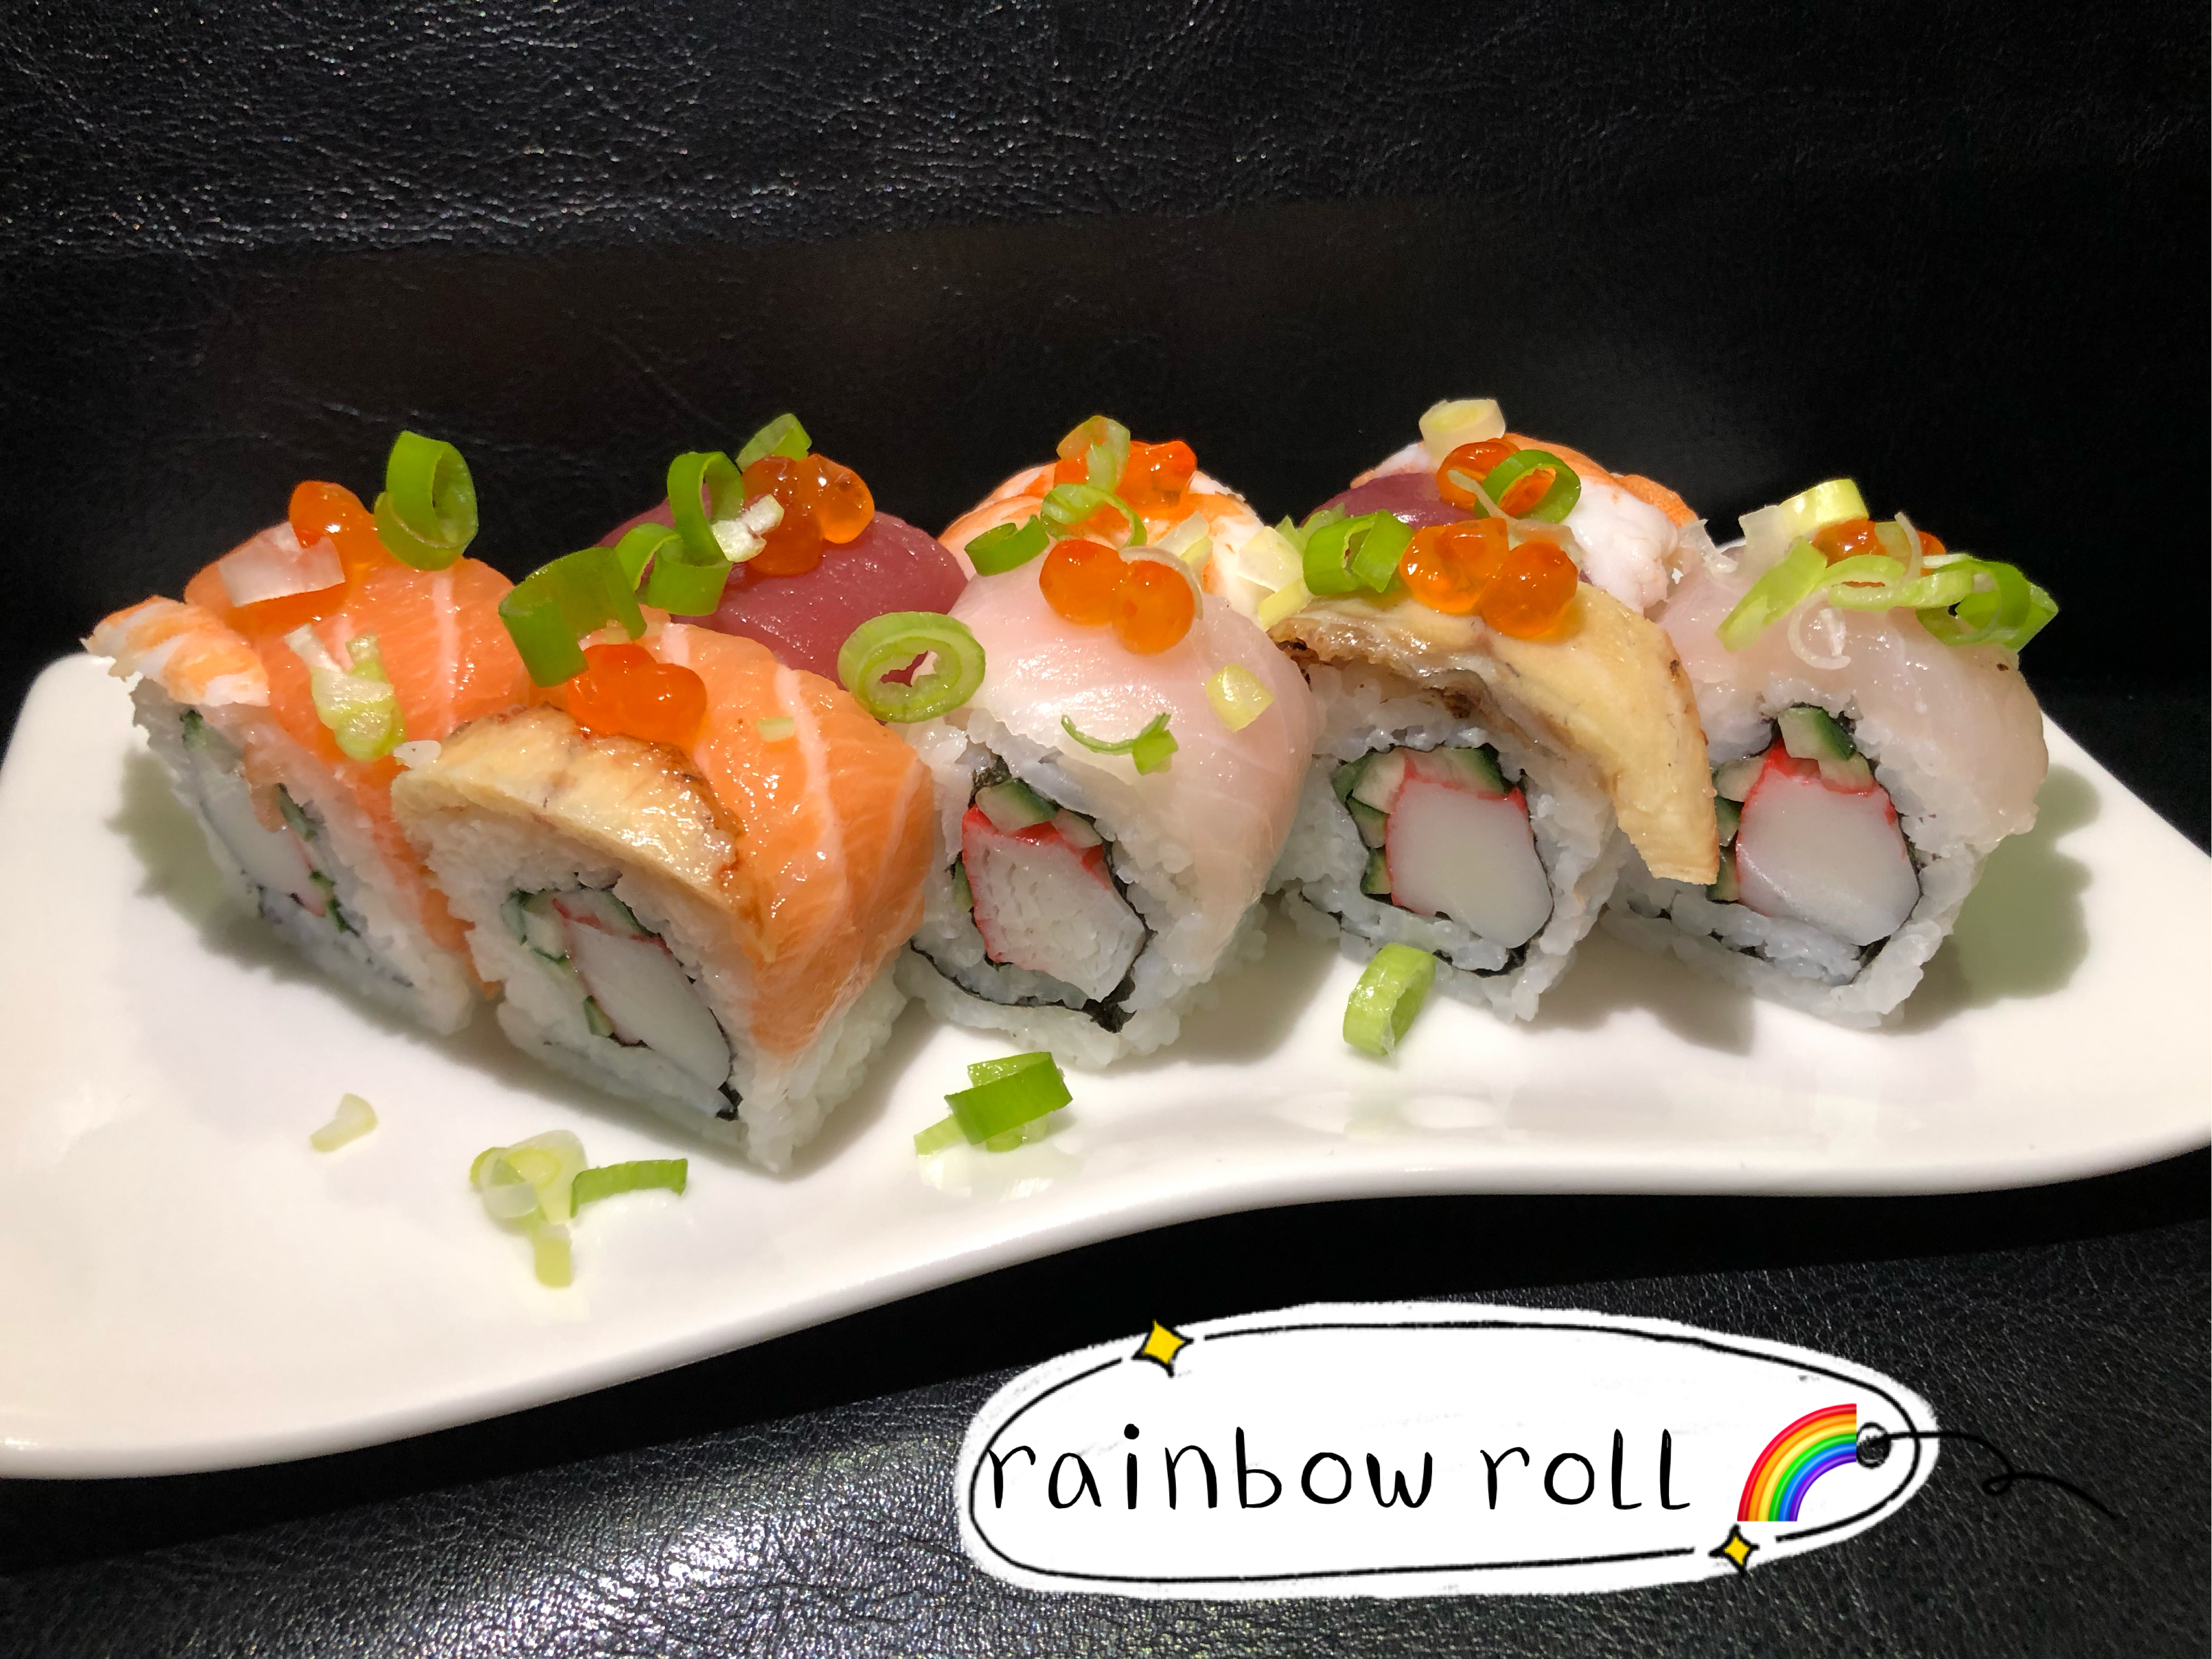 Rainbow roll (8 pcs)